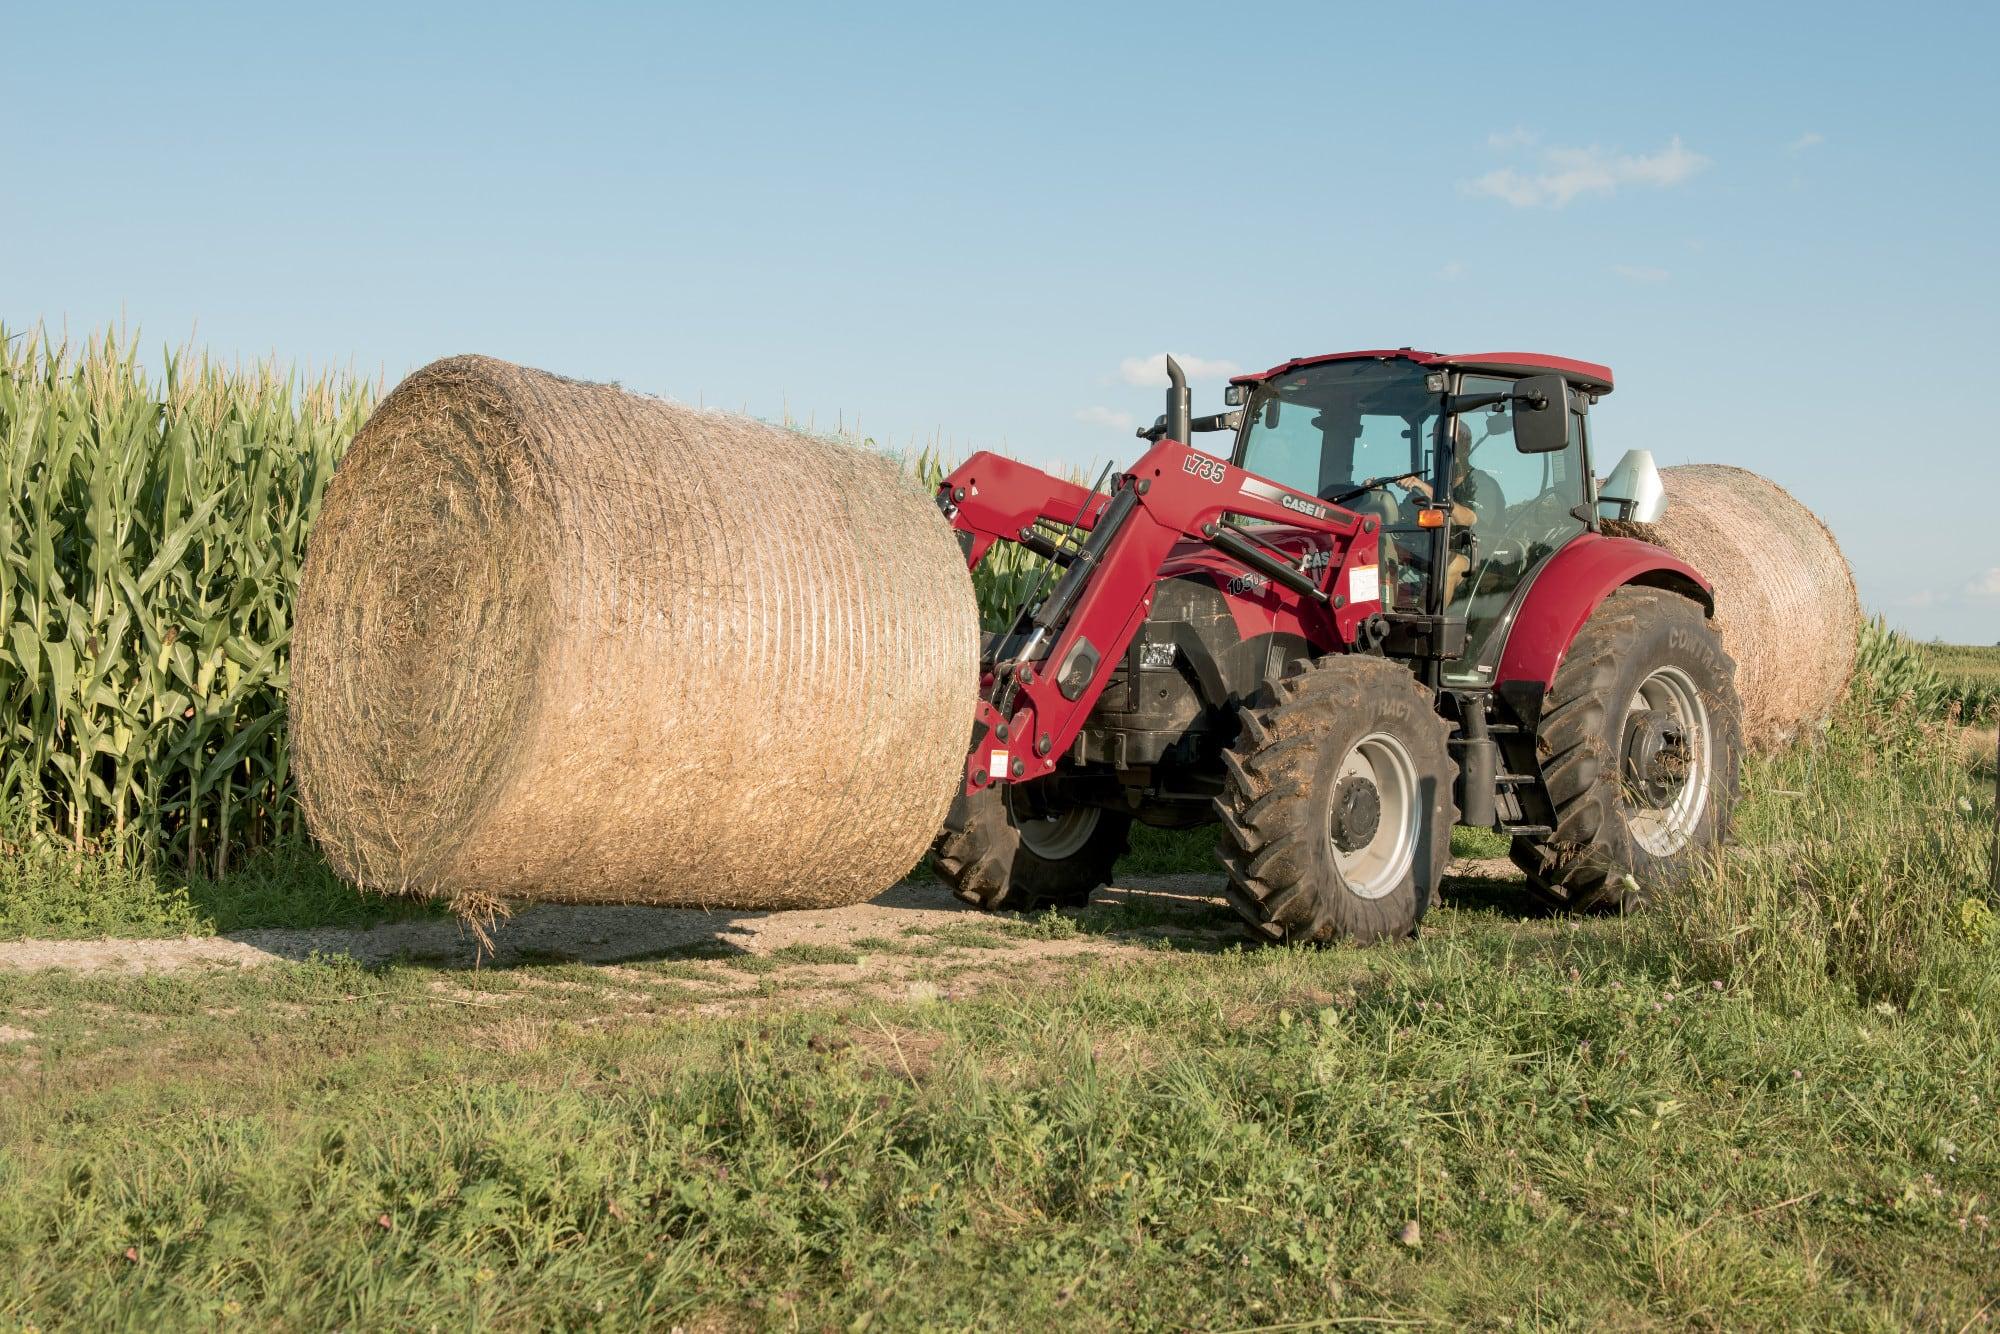 farmall_105u_pmfh 2650_07 13?width=500&height=300 loaders & attachments tractors & planters case ih